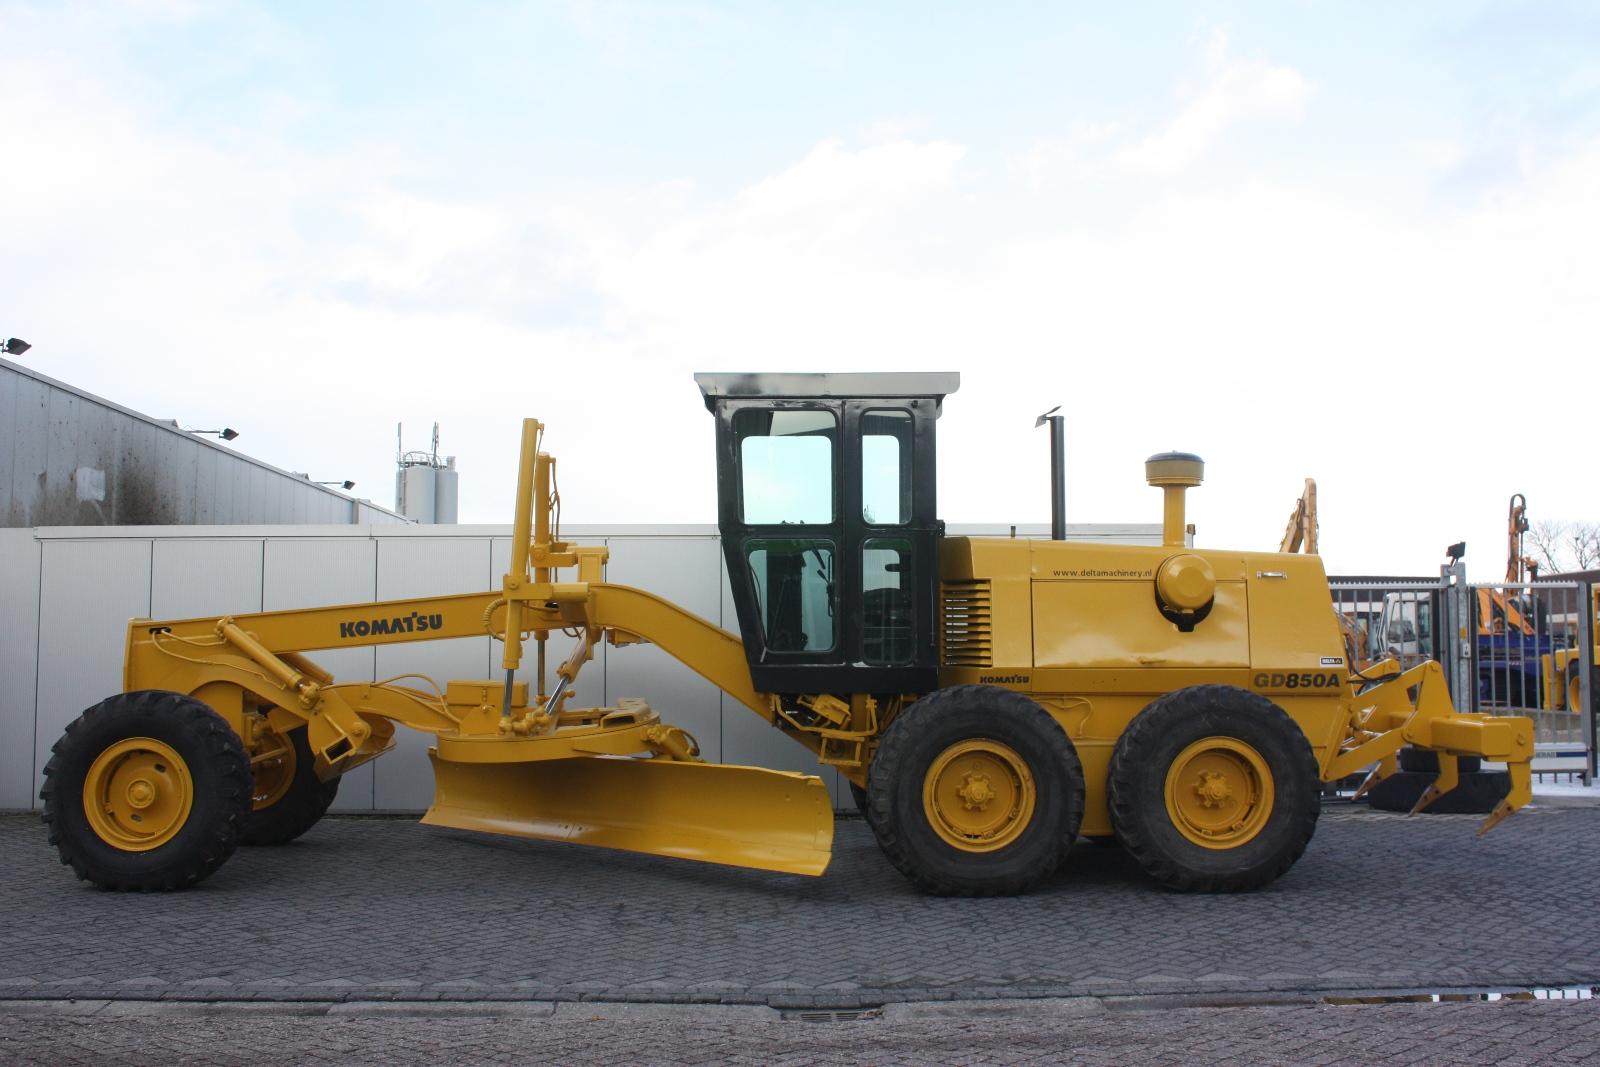 Equipment Sales And Service Komatsu on Komatsu Heavy Equipment